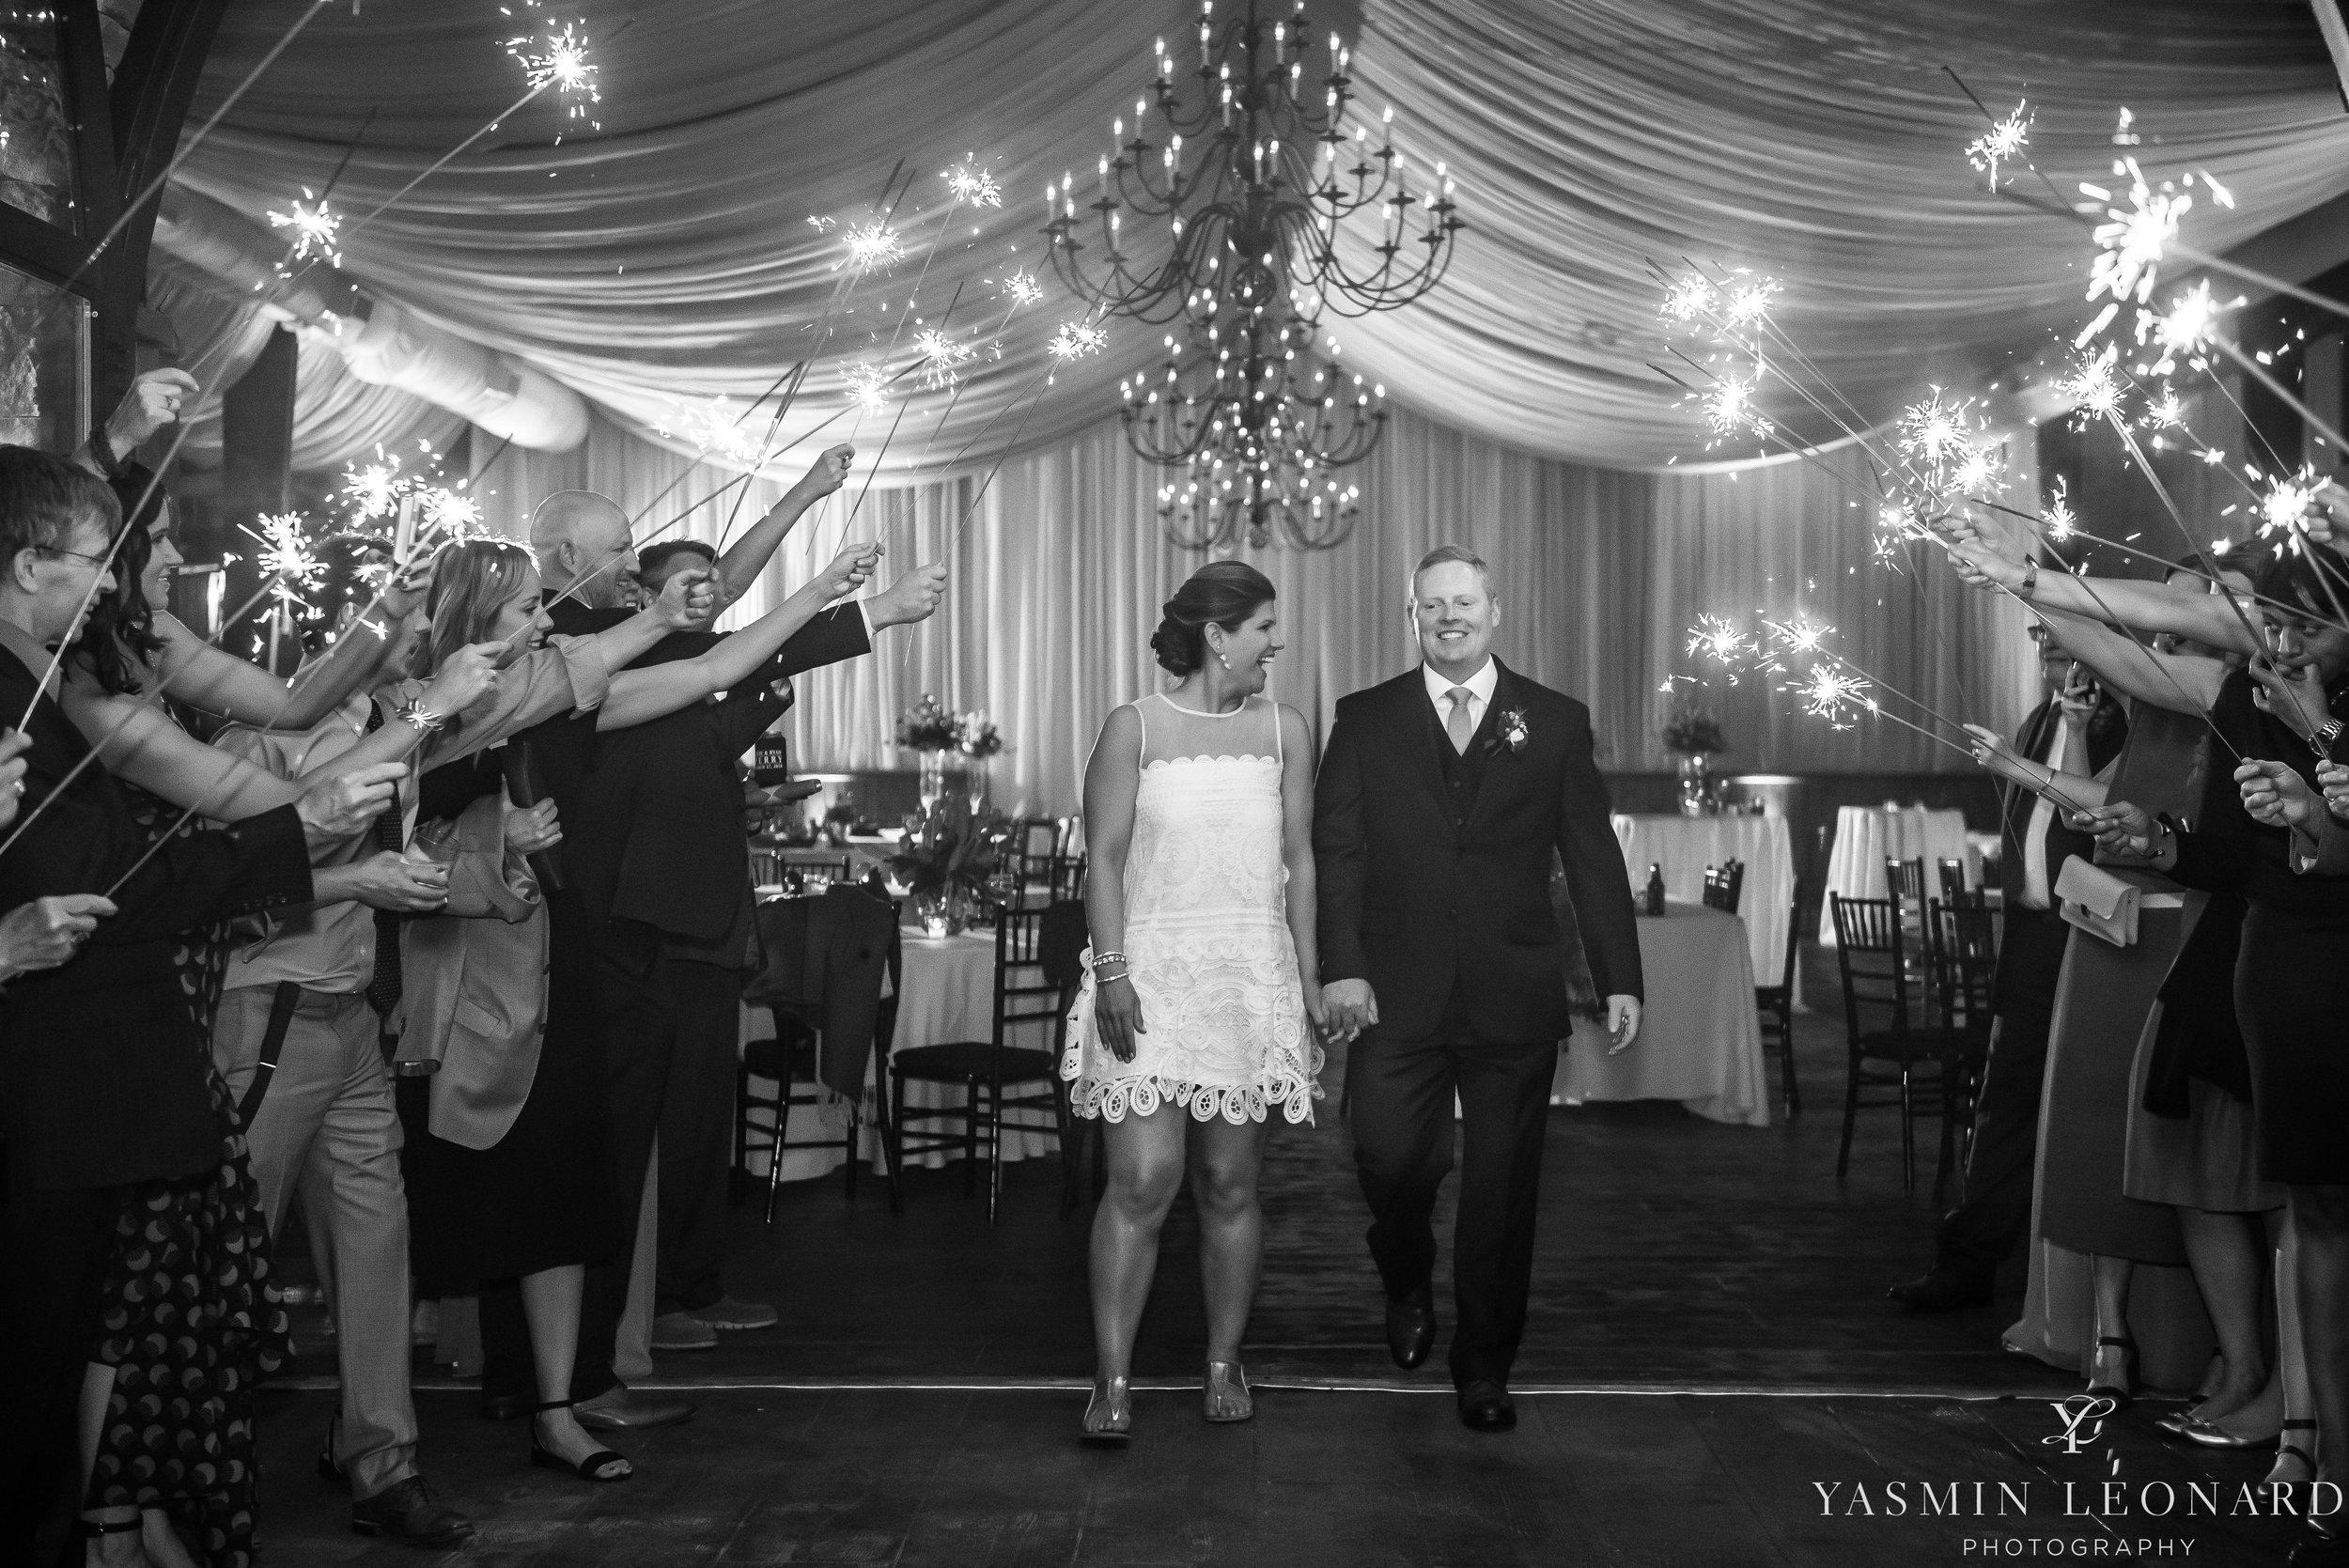 Adaumont Farm - Adaumont Farm Weddings - Trinity Weddings - NC Weddings - Yasmin Leonard Photography-105.jpg